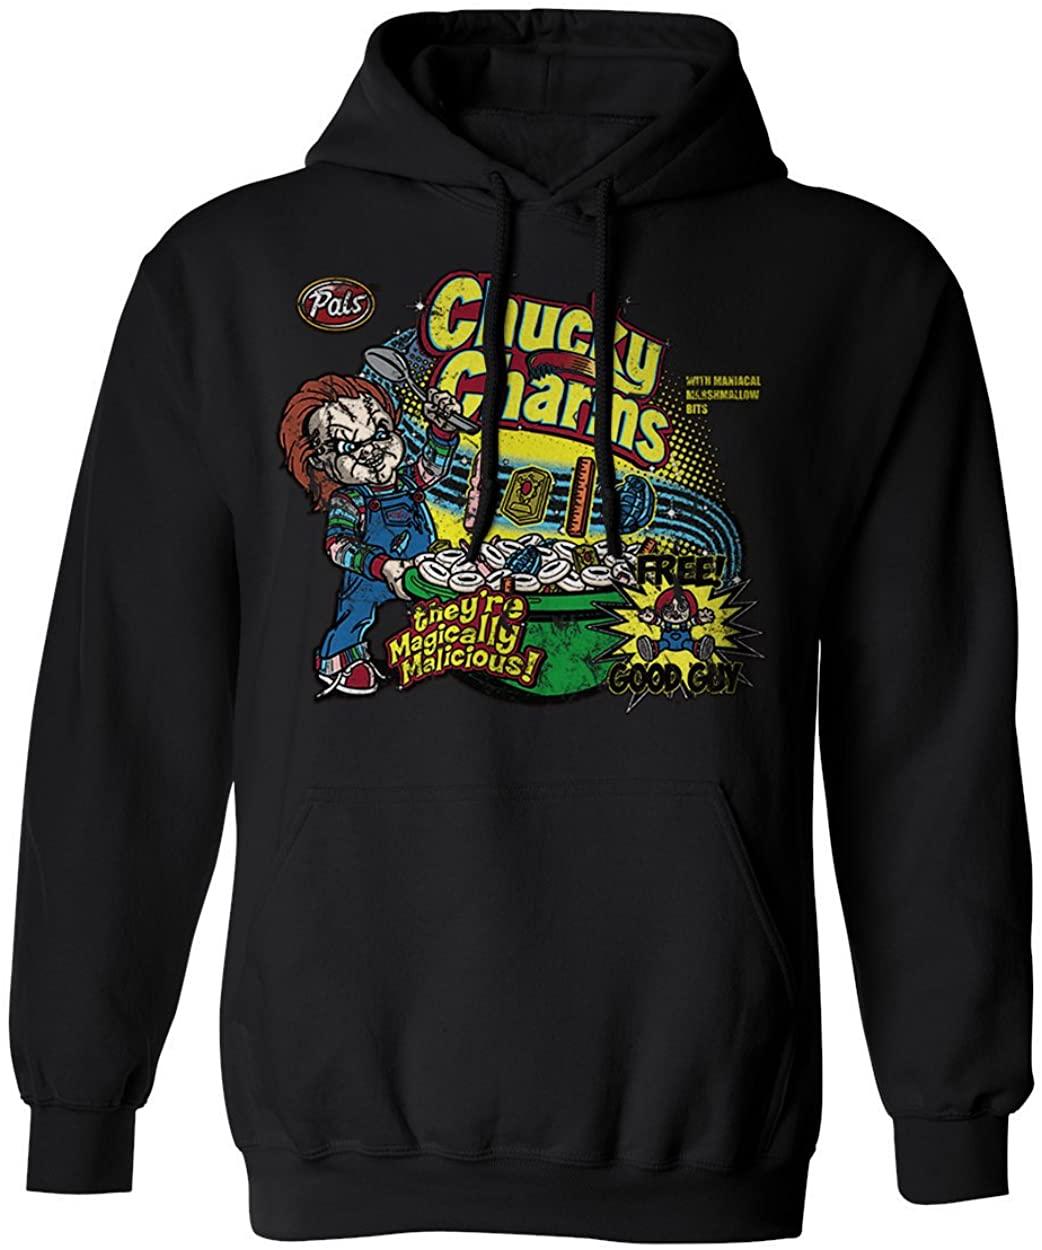 RIVEBELLA New Graphic Shirt Chucky Charms Novelty Tee Horror Men's Hoodie Hooded Sweatshirt